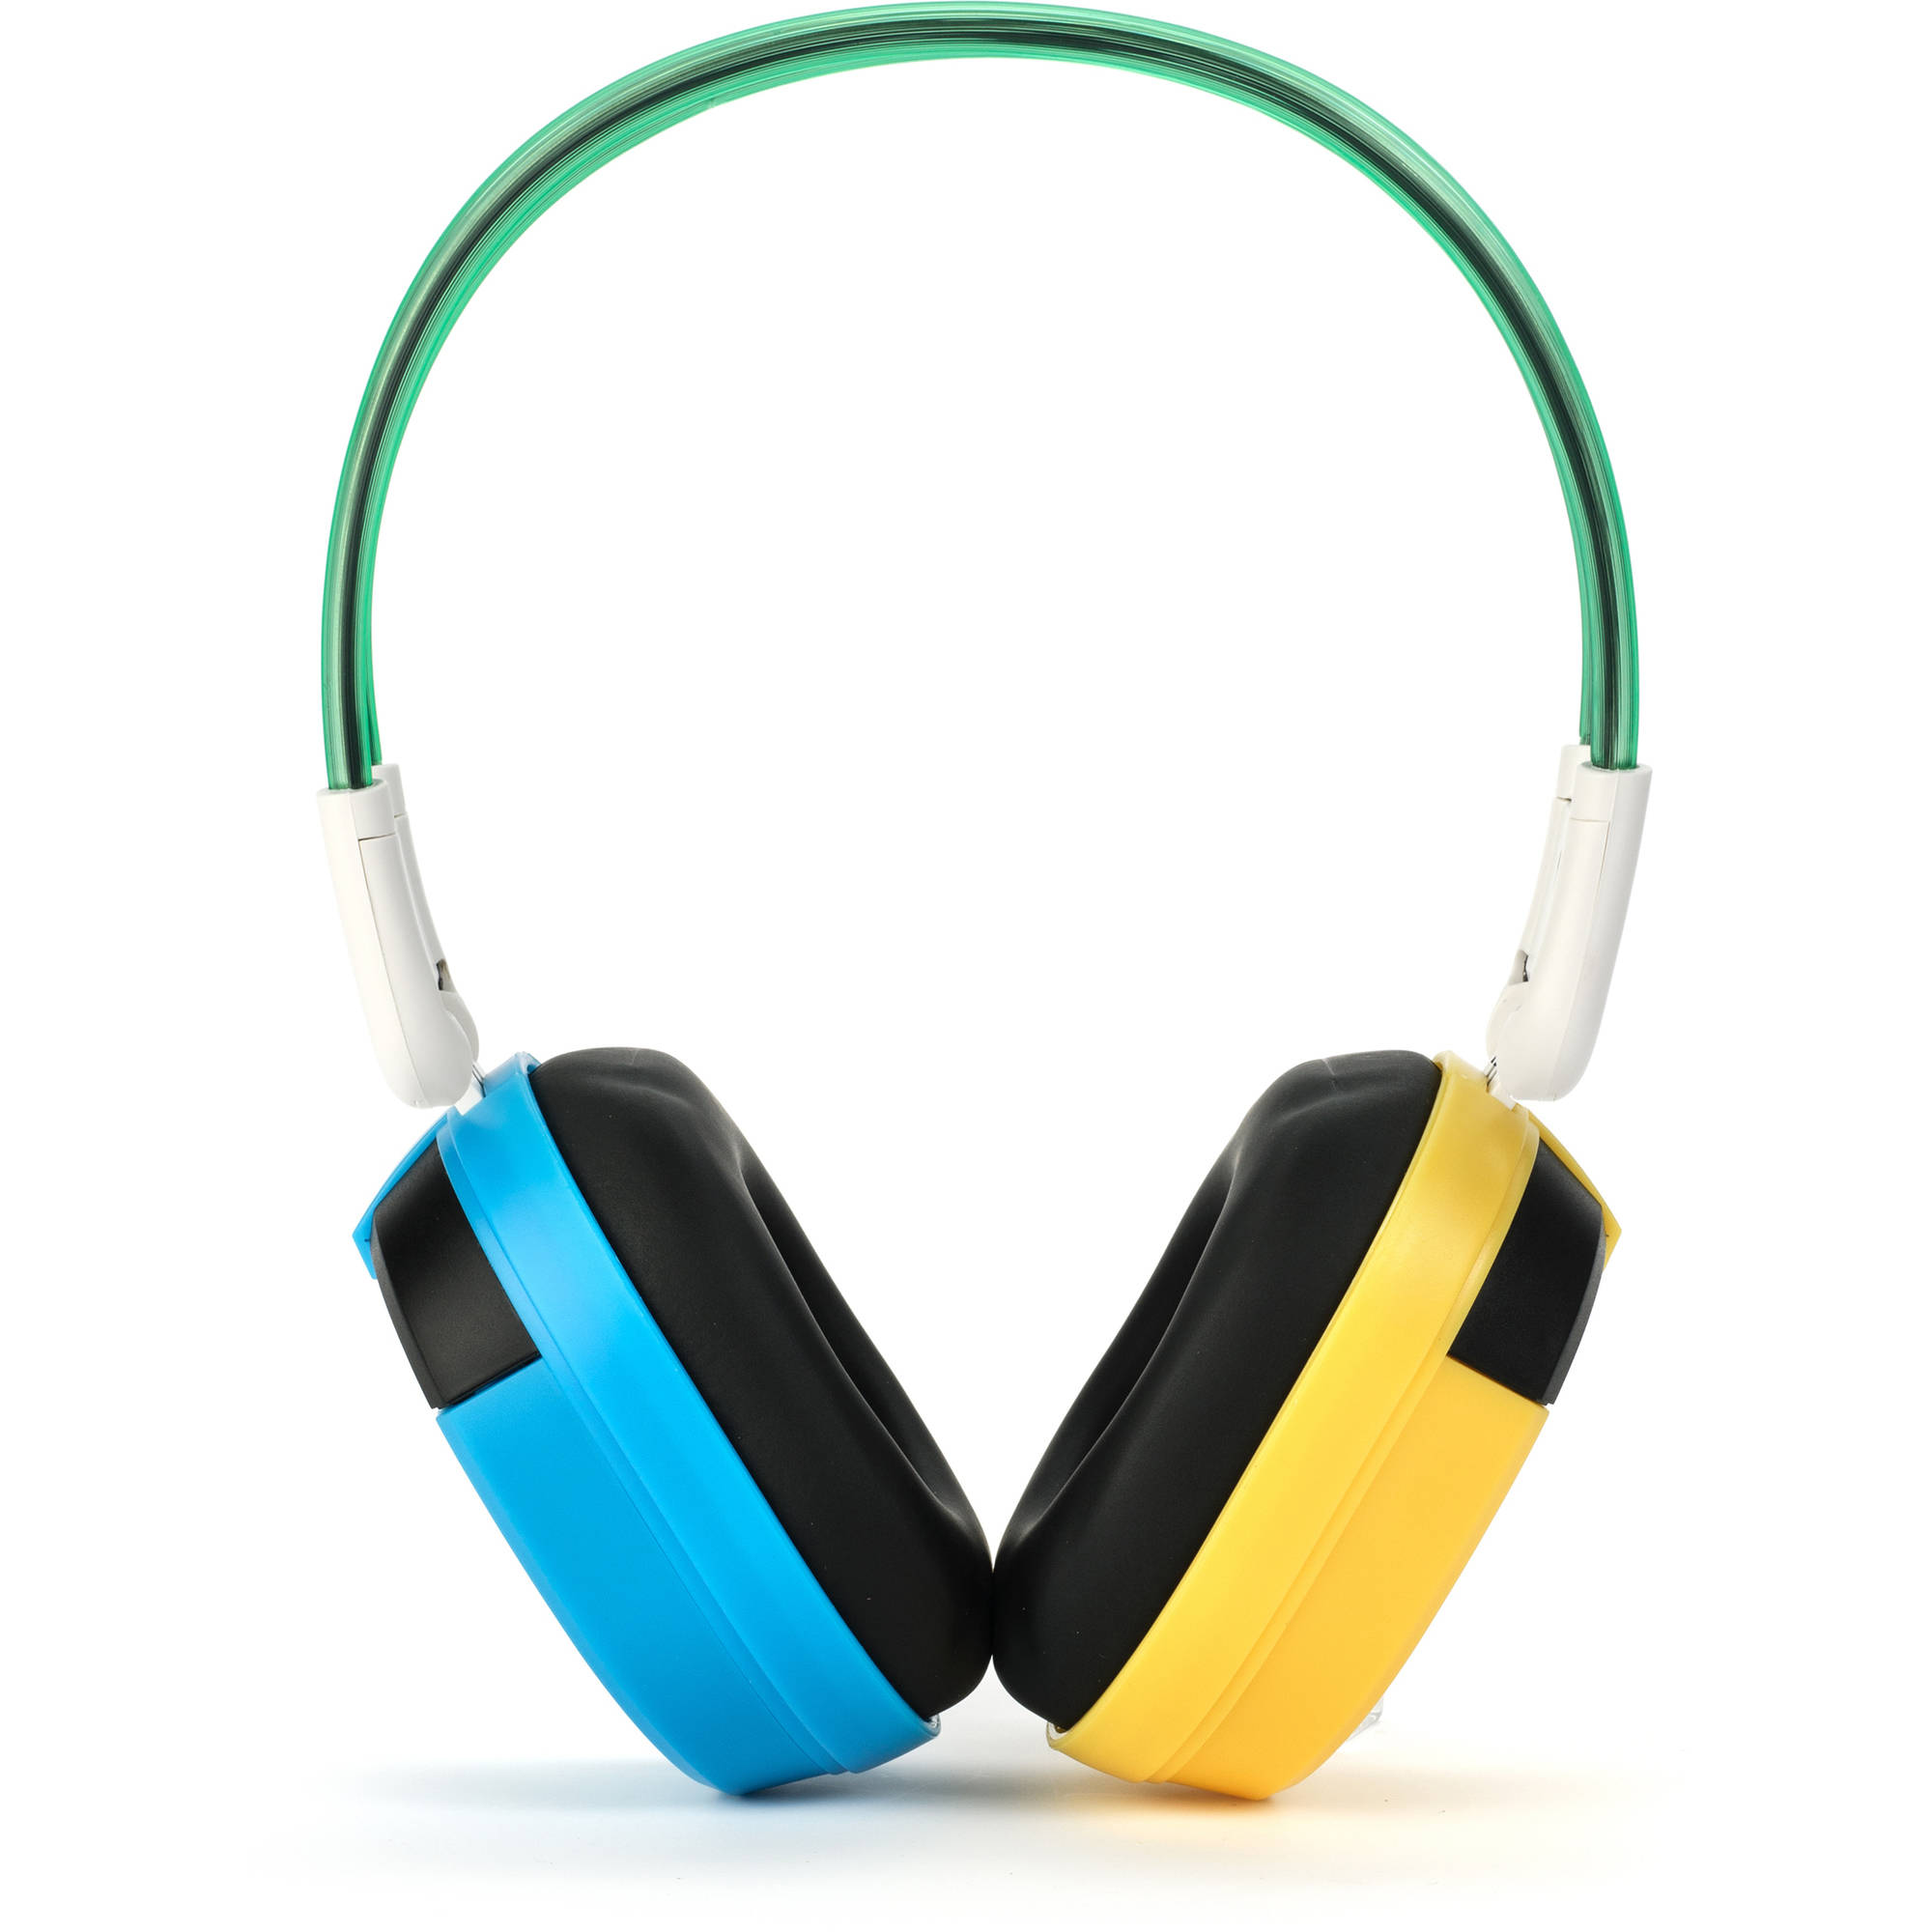 Bravo View IH-09AB - KID FRIENDLY Automotive IR Wireless Headphones (Dual Source)